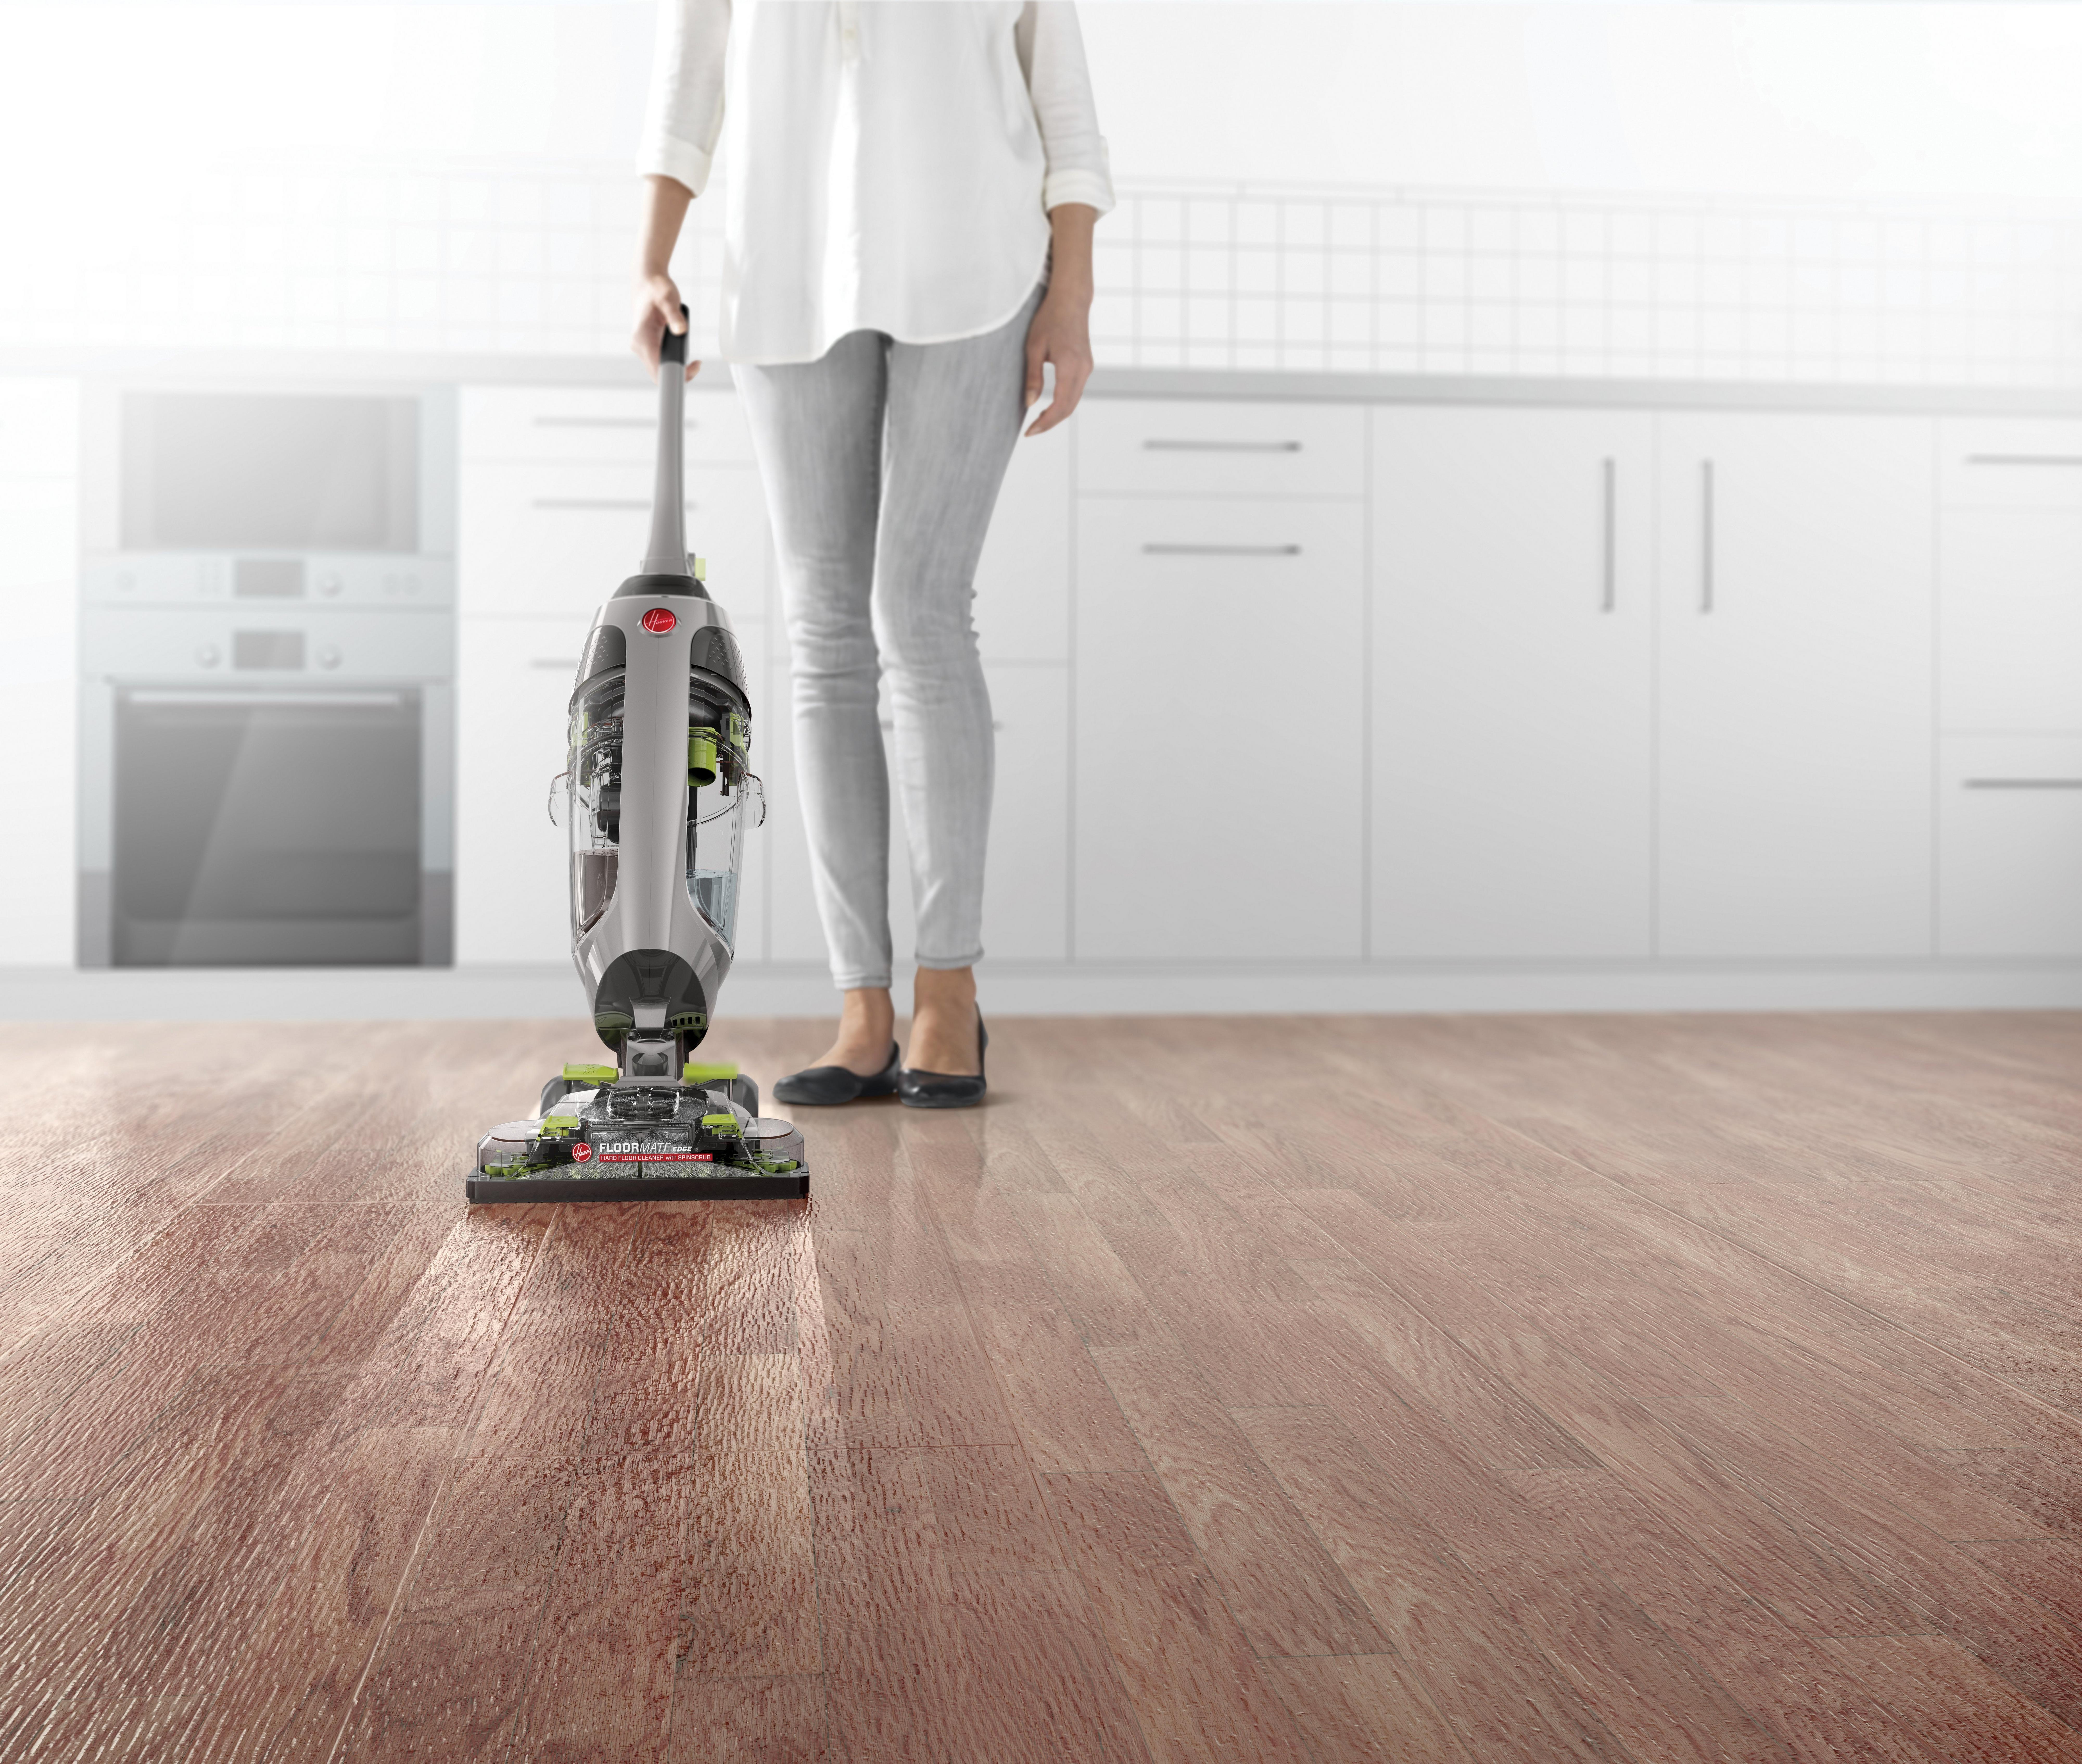 FloorMate Edge Hard Floor Cleaner3